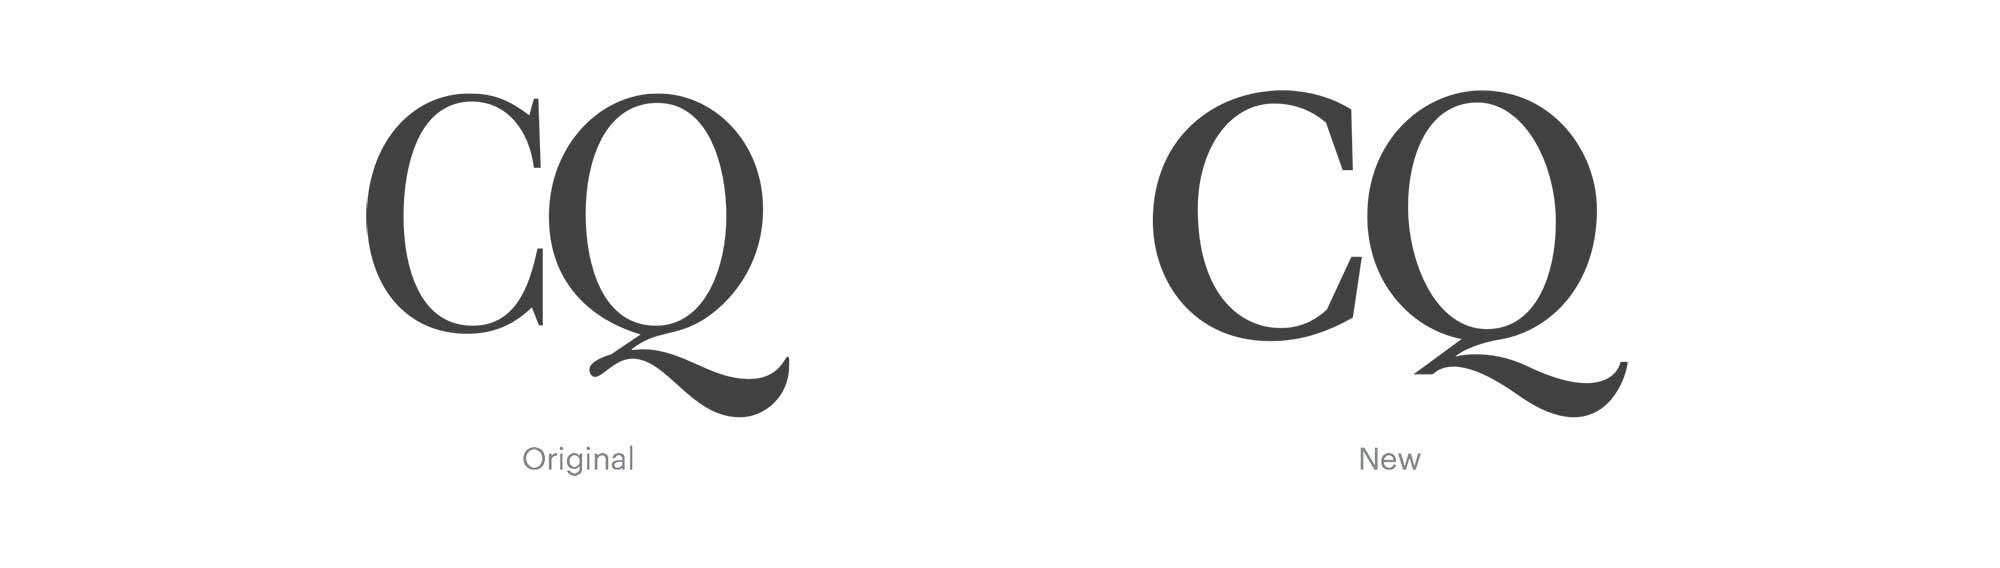 cq-logo